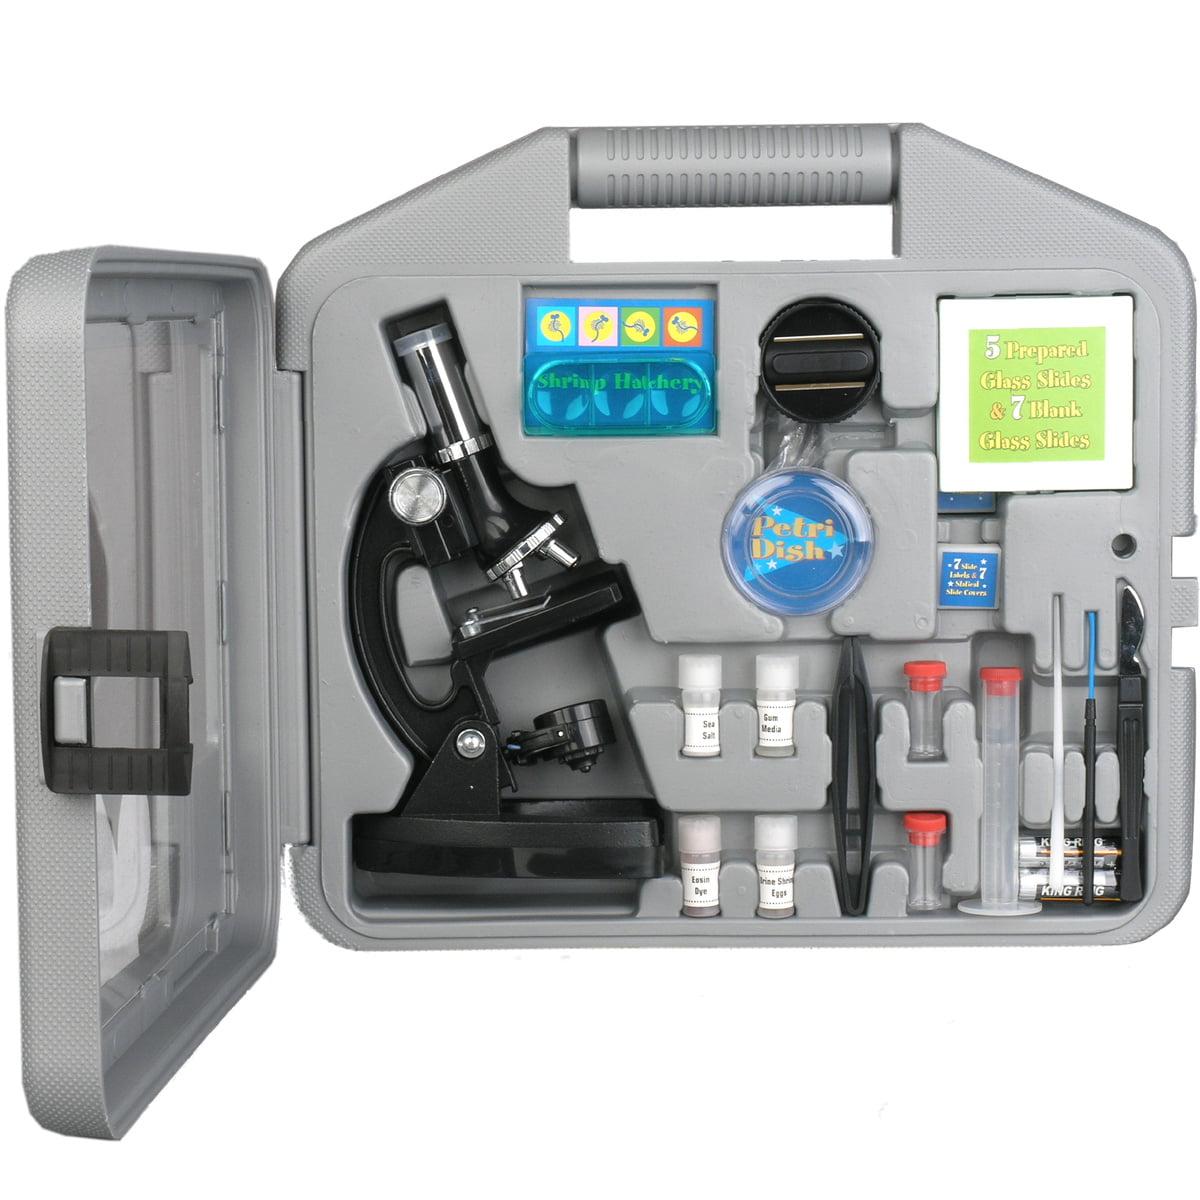 AmScope AMSCOPE-KIDS 120X-240X-300X-480X-600X-1200X Metal Arm Kids Children Biological Microscope Kit New by